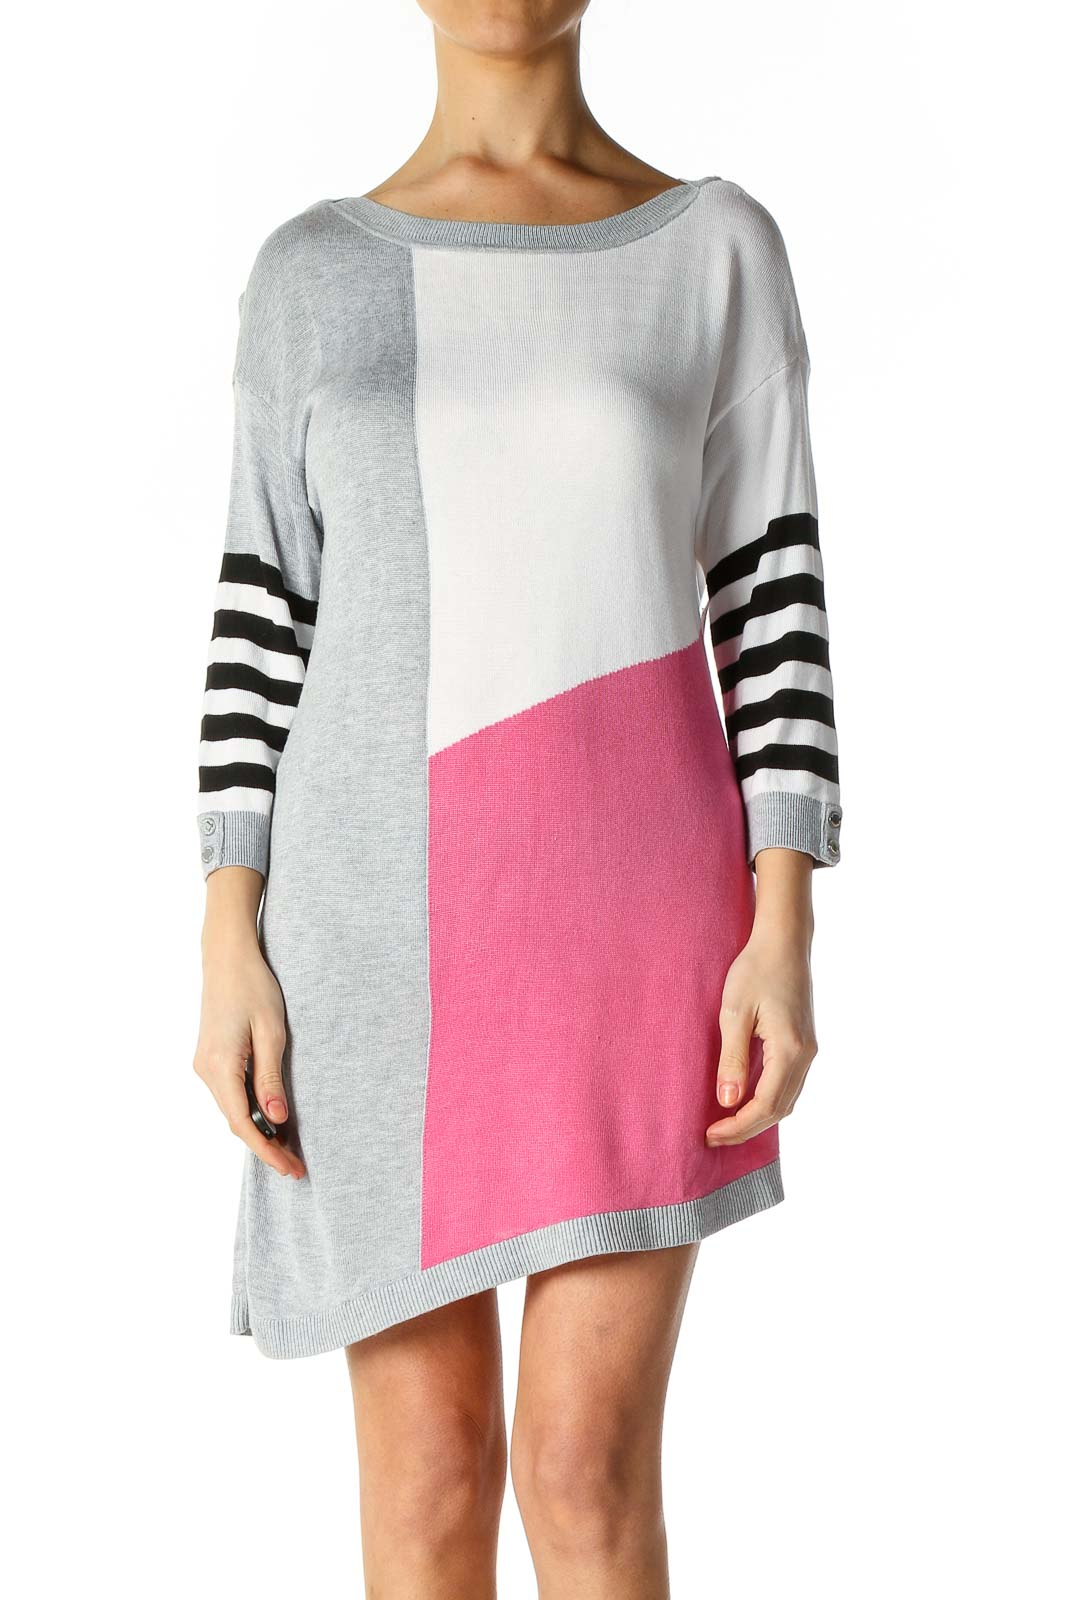 Gray Texture Shift Dress Front